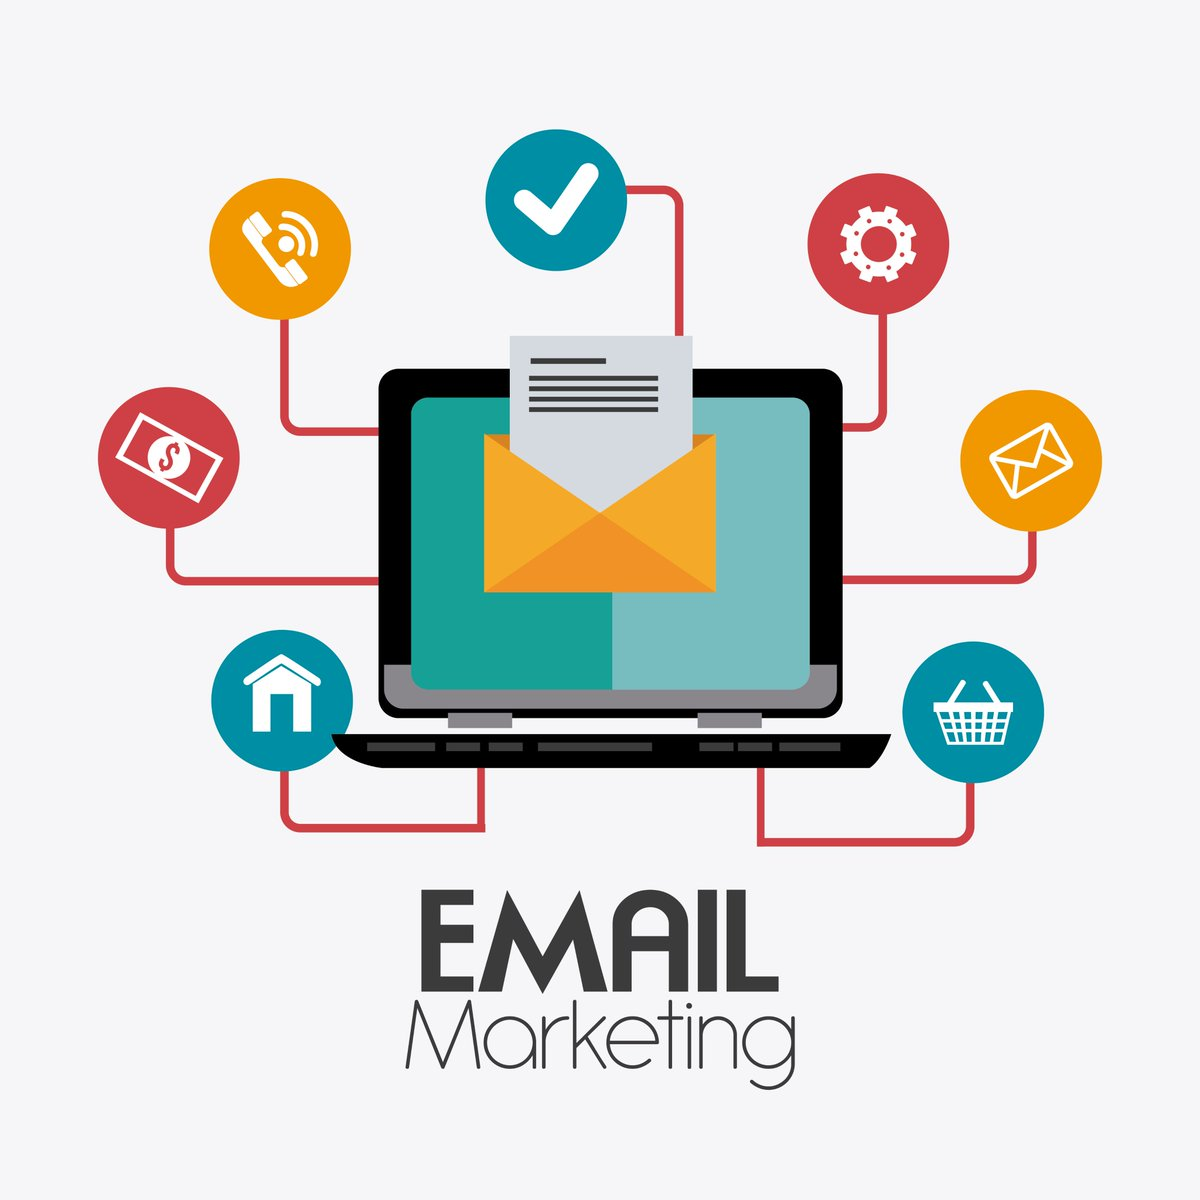 email-marketing-dicas-mkt-drops-digital-1